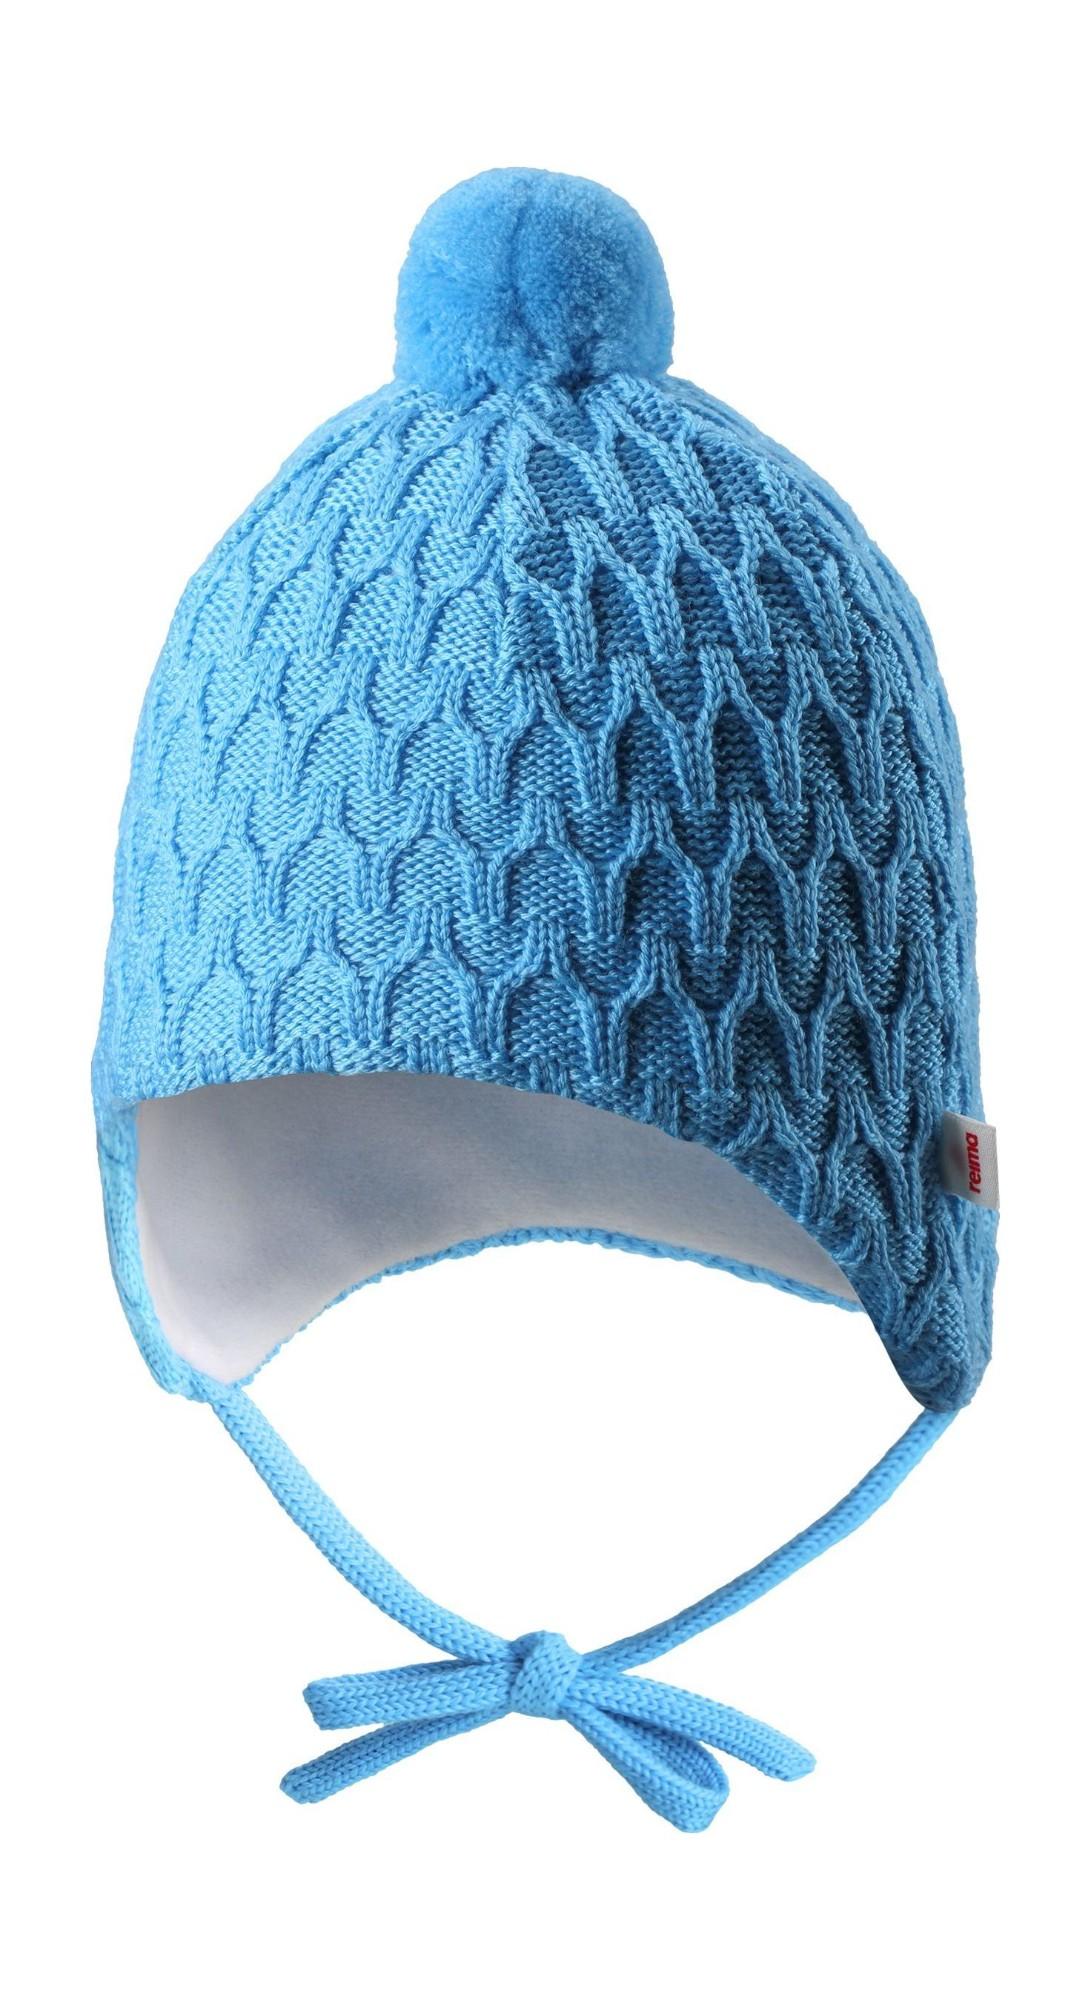 REIMA Unetus Icy Blue 44